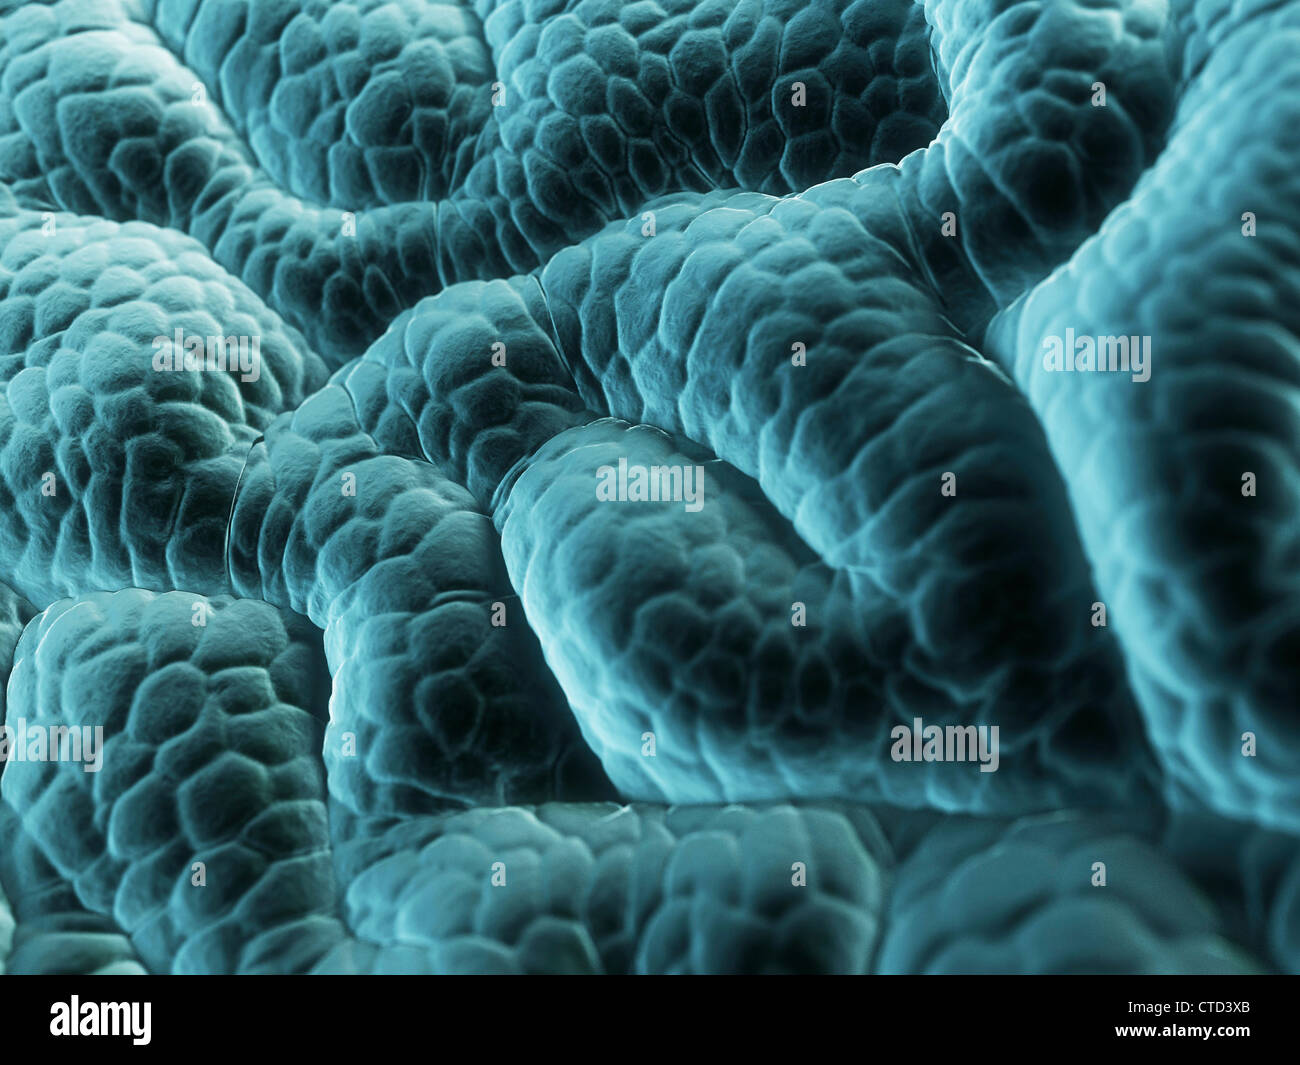 Stomach lining  artwork - Stock Image